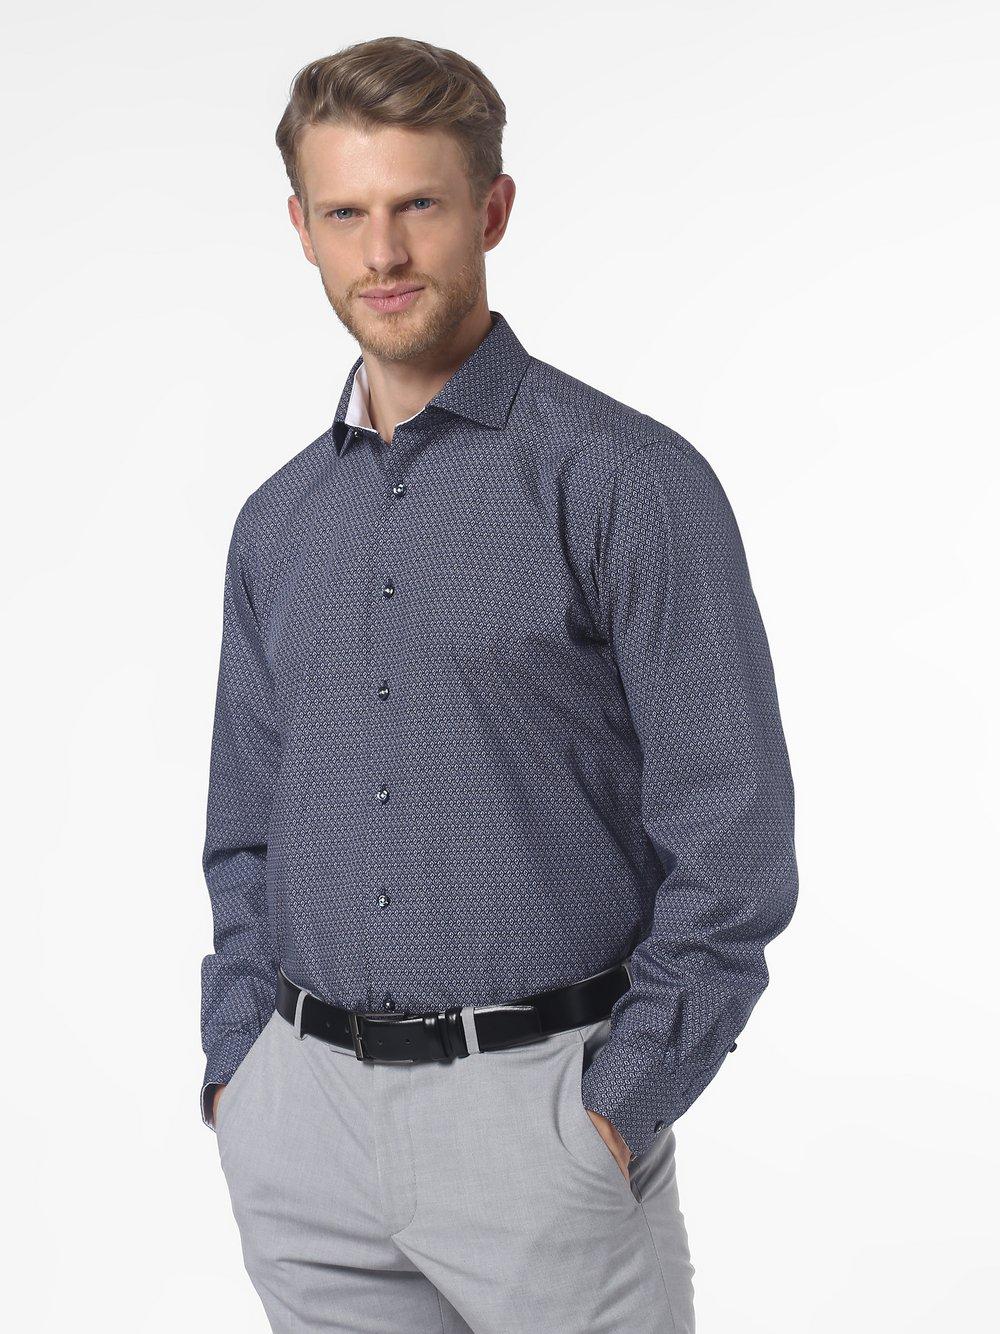 James – Koszula męska łatwa w prasowaniu, niebieski Van Graaf 461392-0010-00420